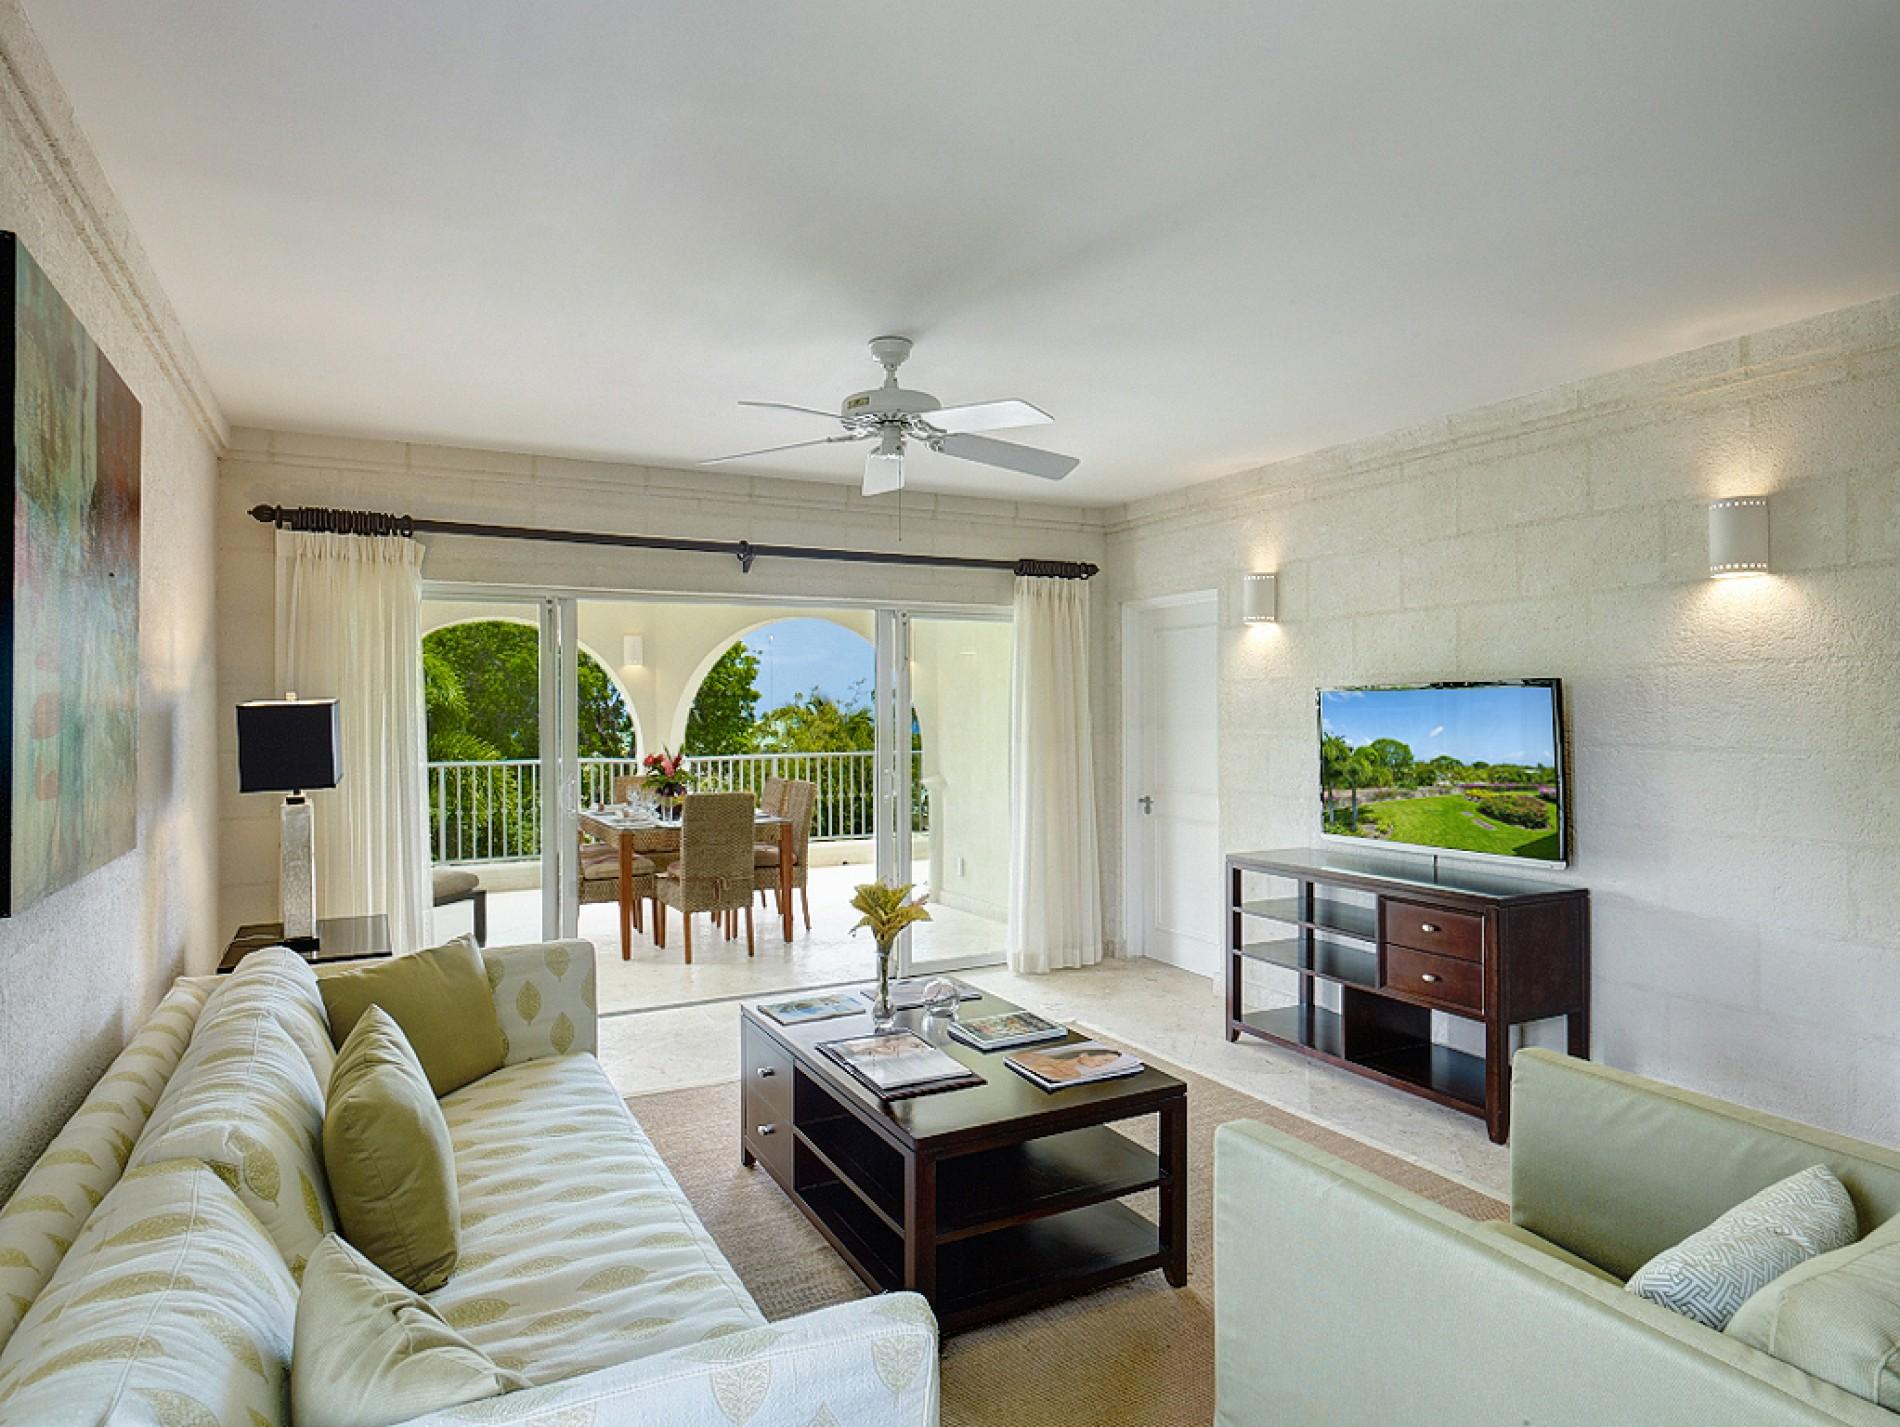 Royal Apartment 121 Shimmer - 3 Bedrooms